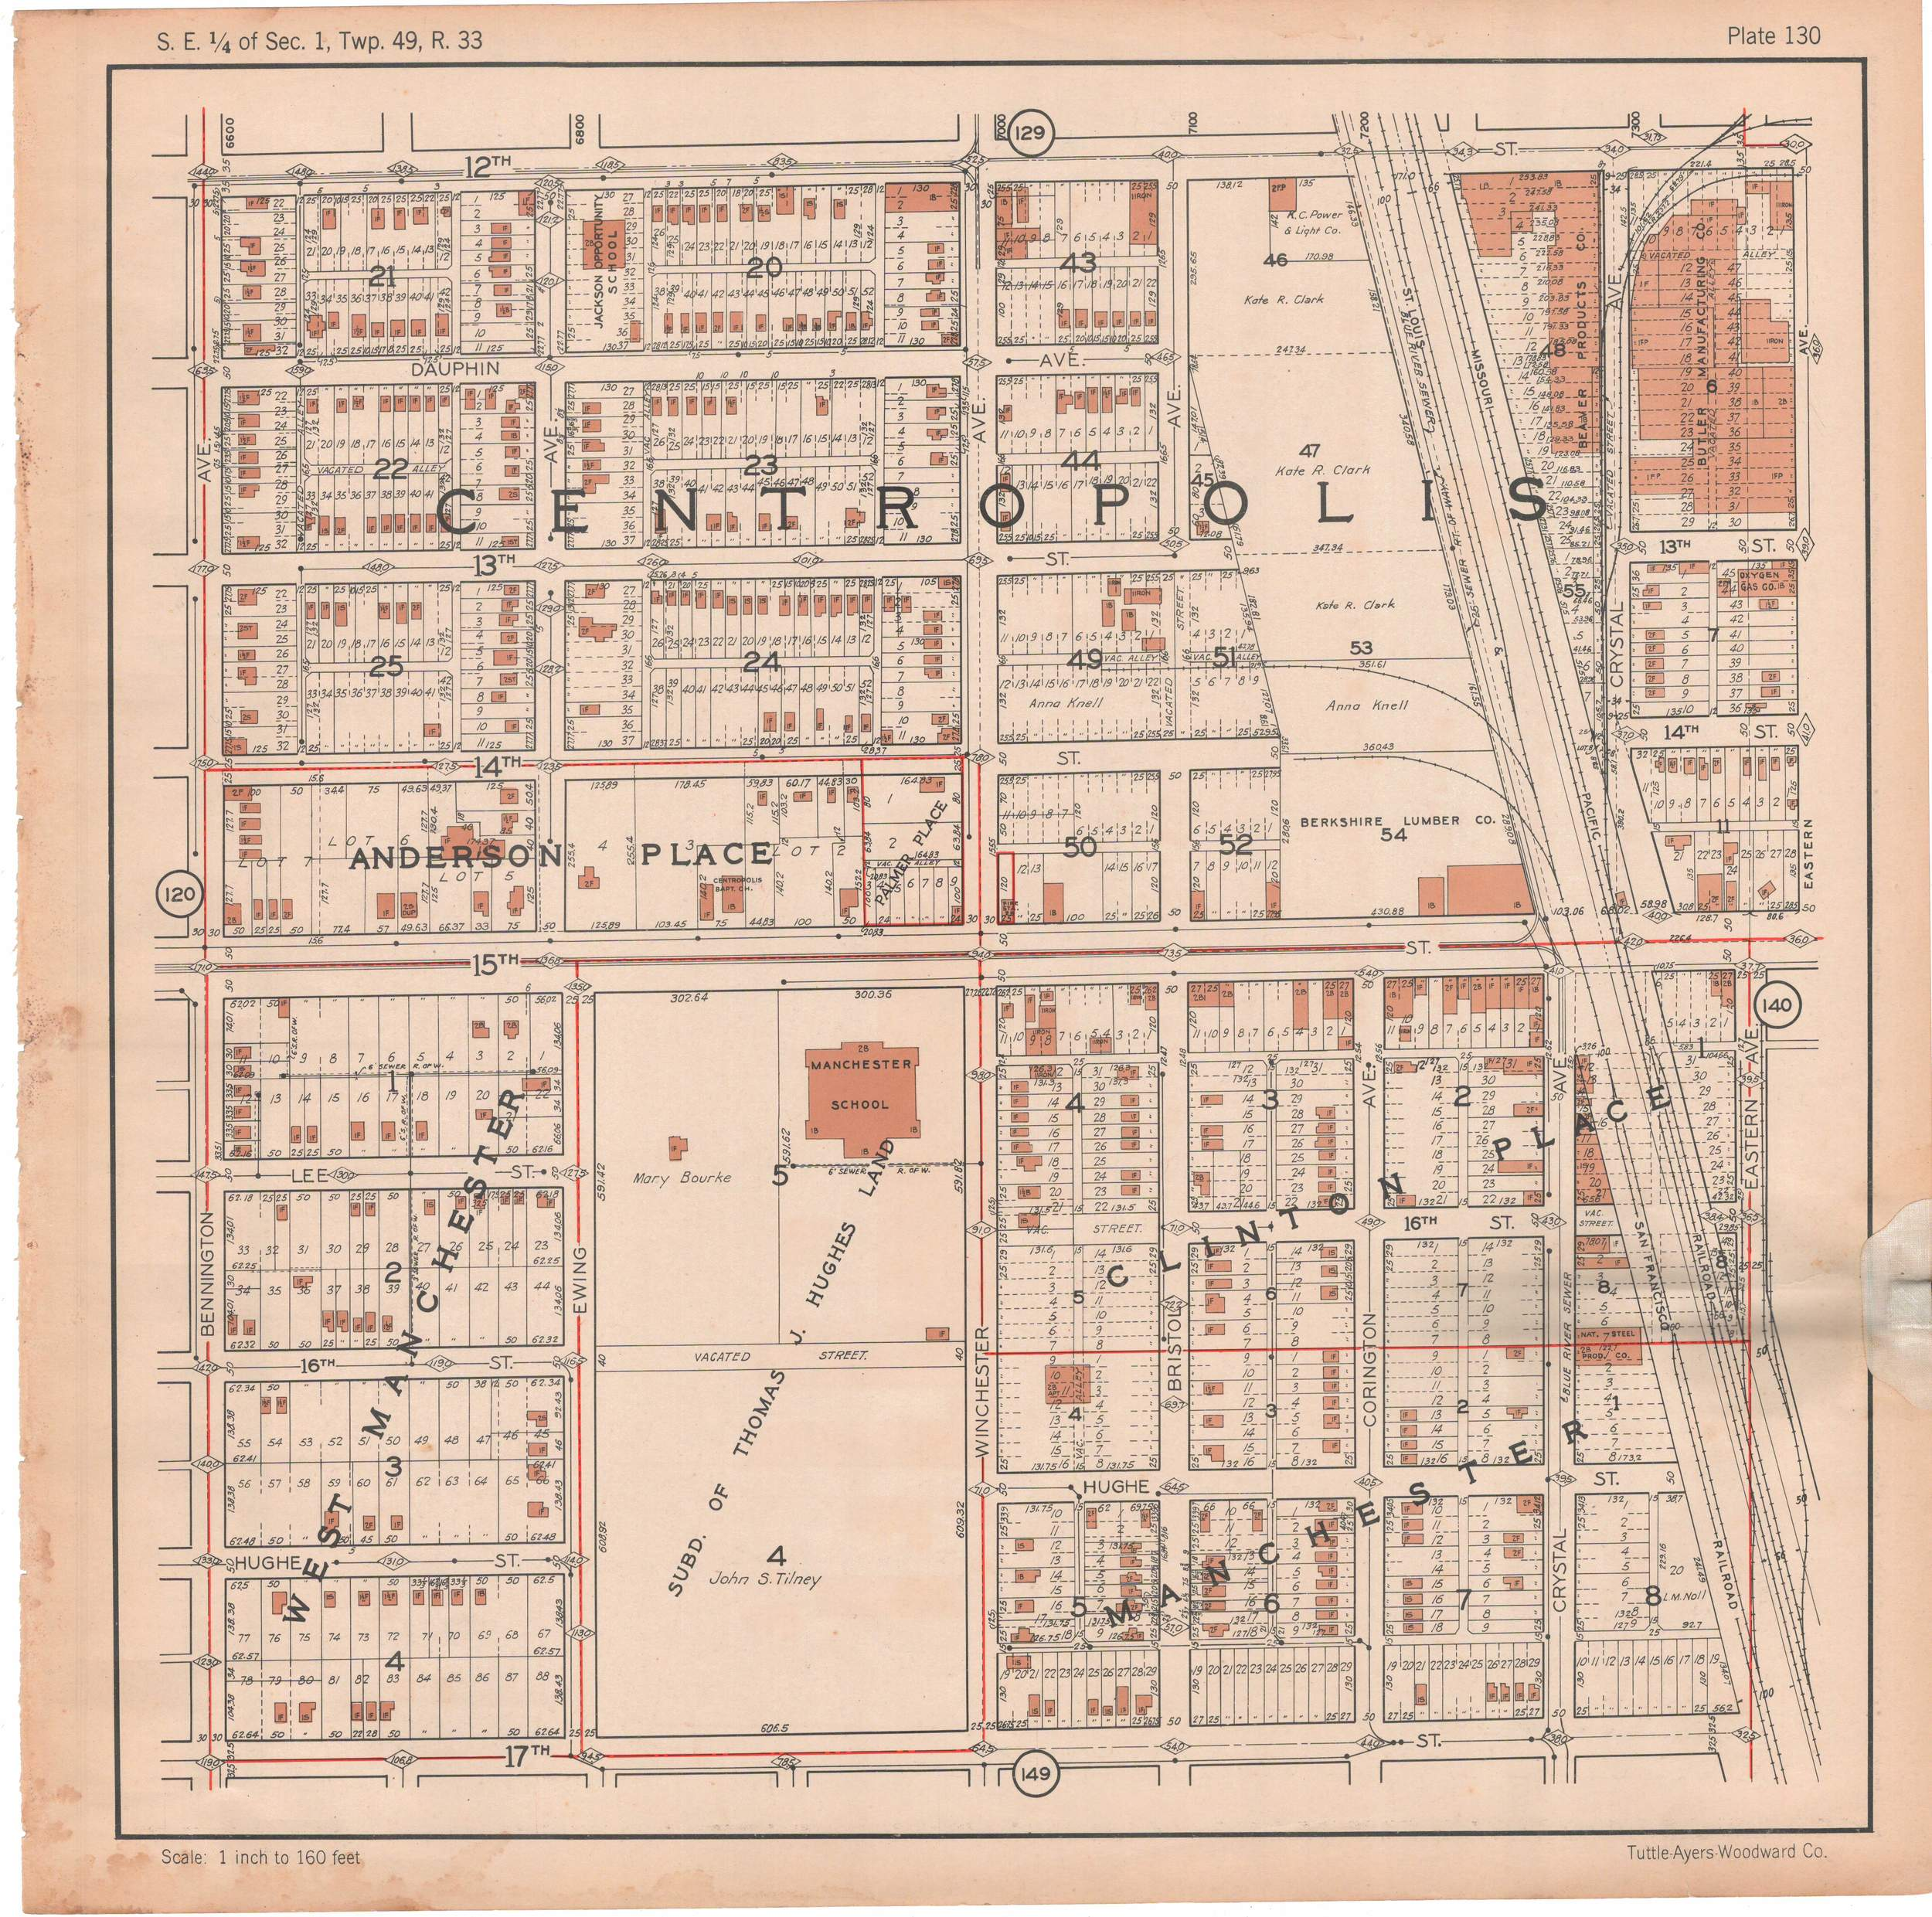 1925 TUTTLE_AYERS_Plate 130.JPG